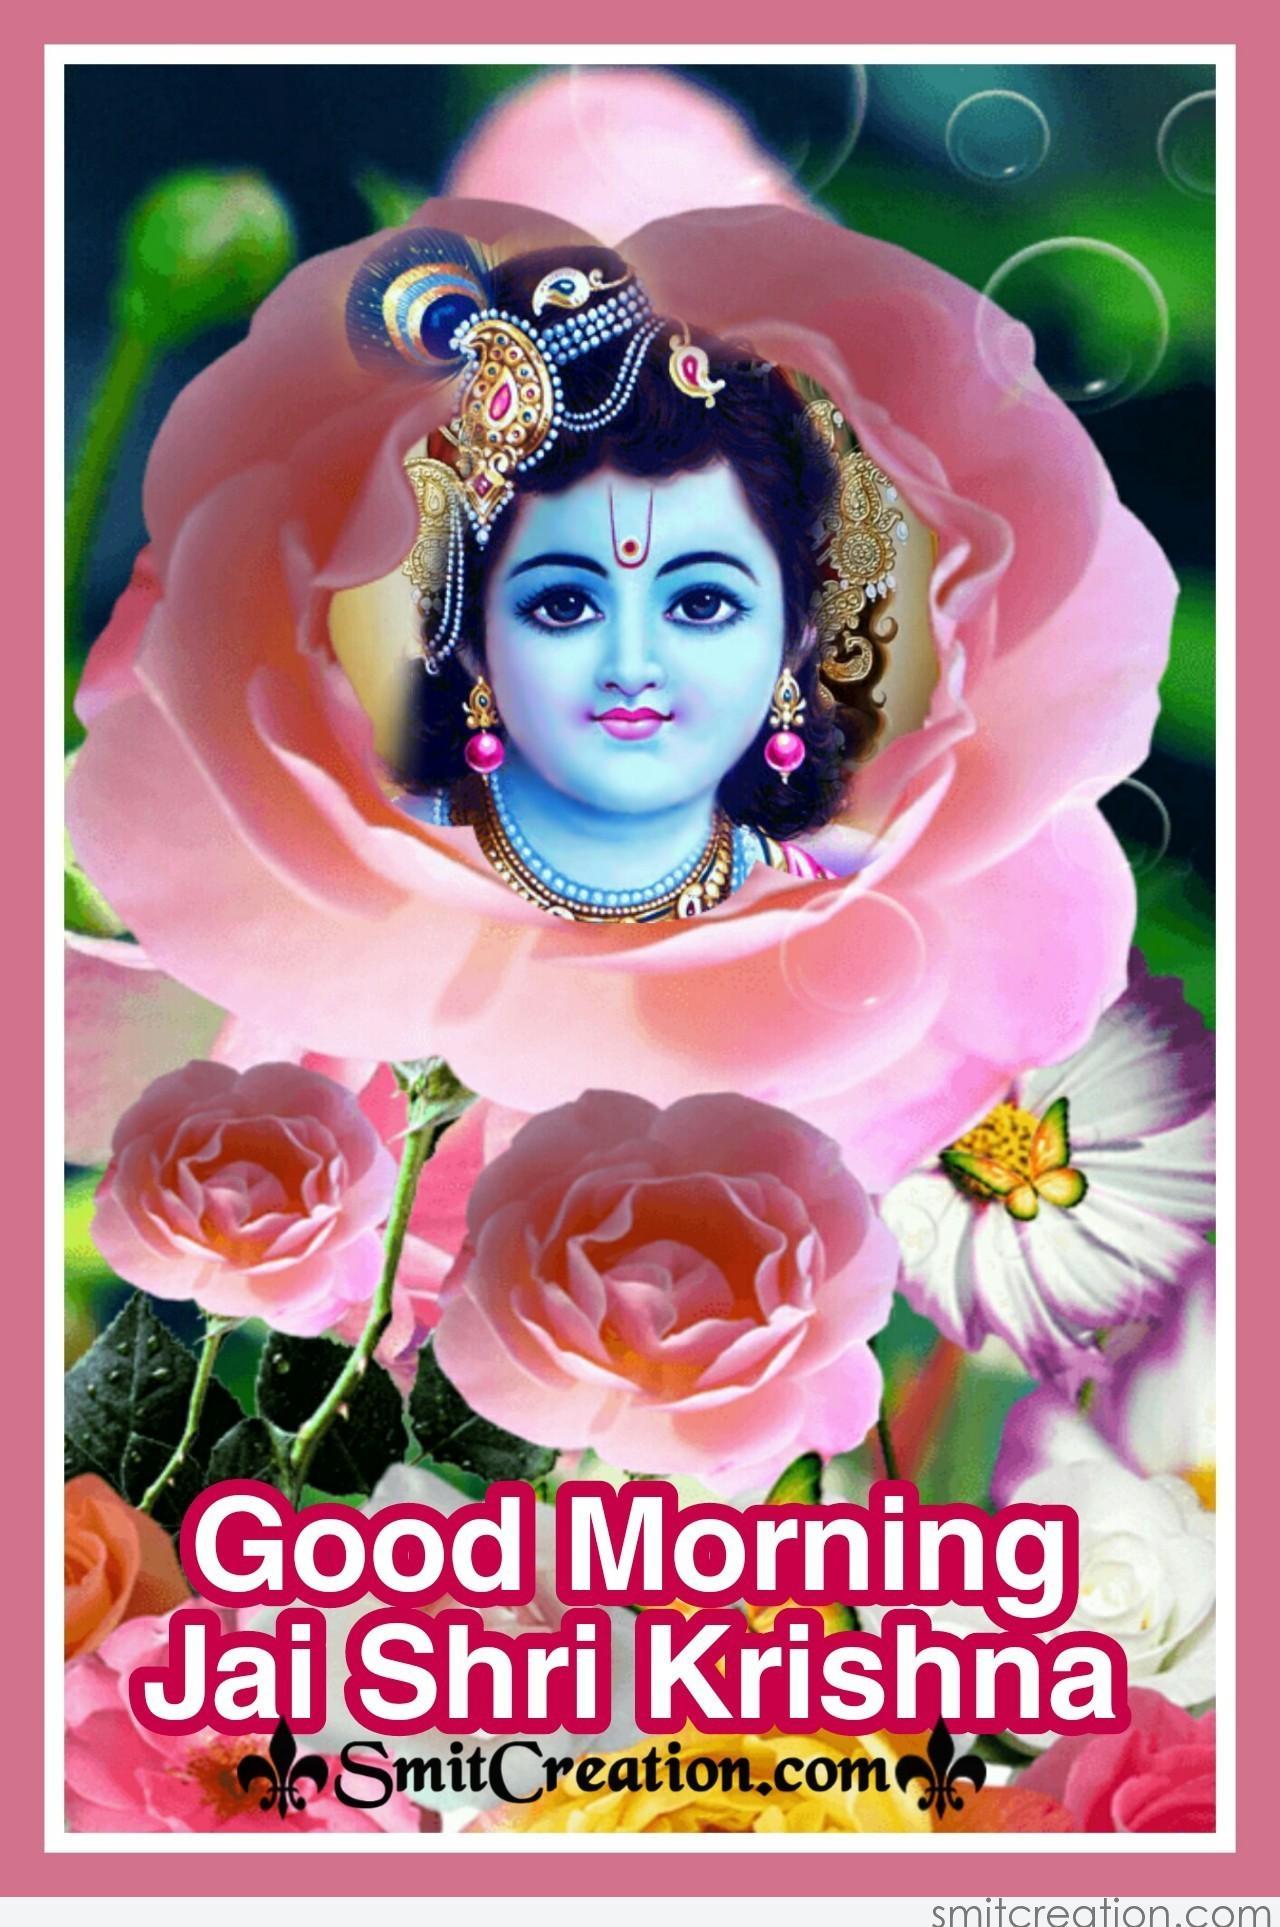 Bal Krishna Good Morning Pictures And Graphics Smitcreationcom